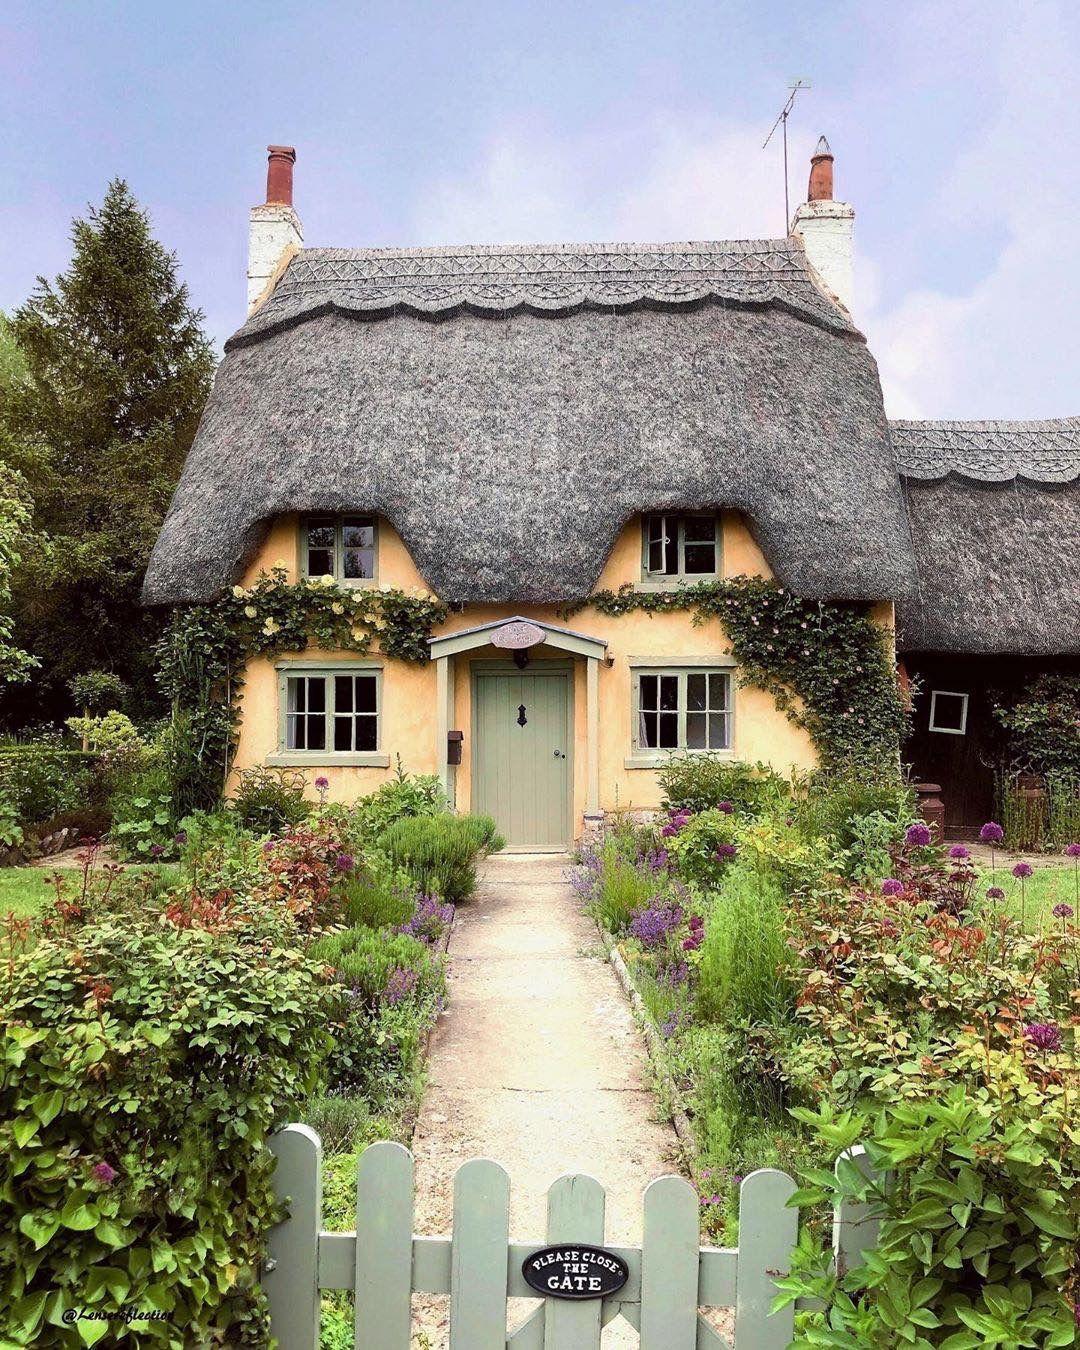 Honington, Warwickshire, England.